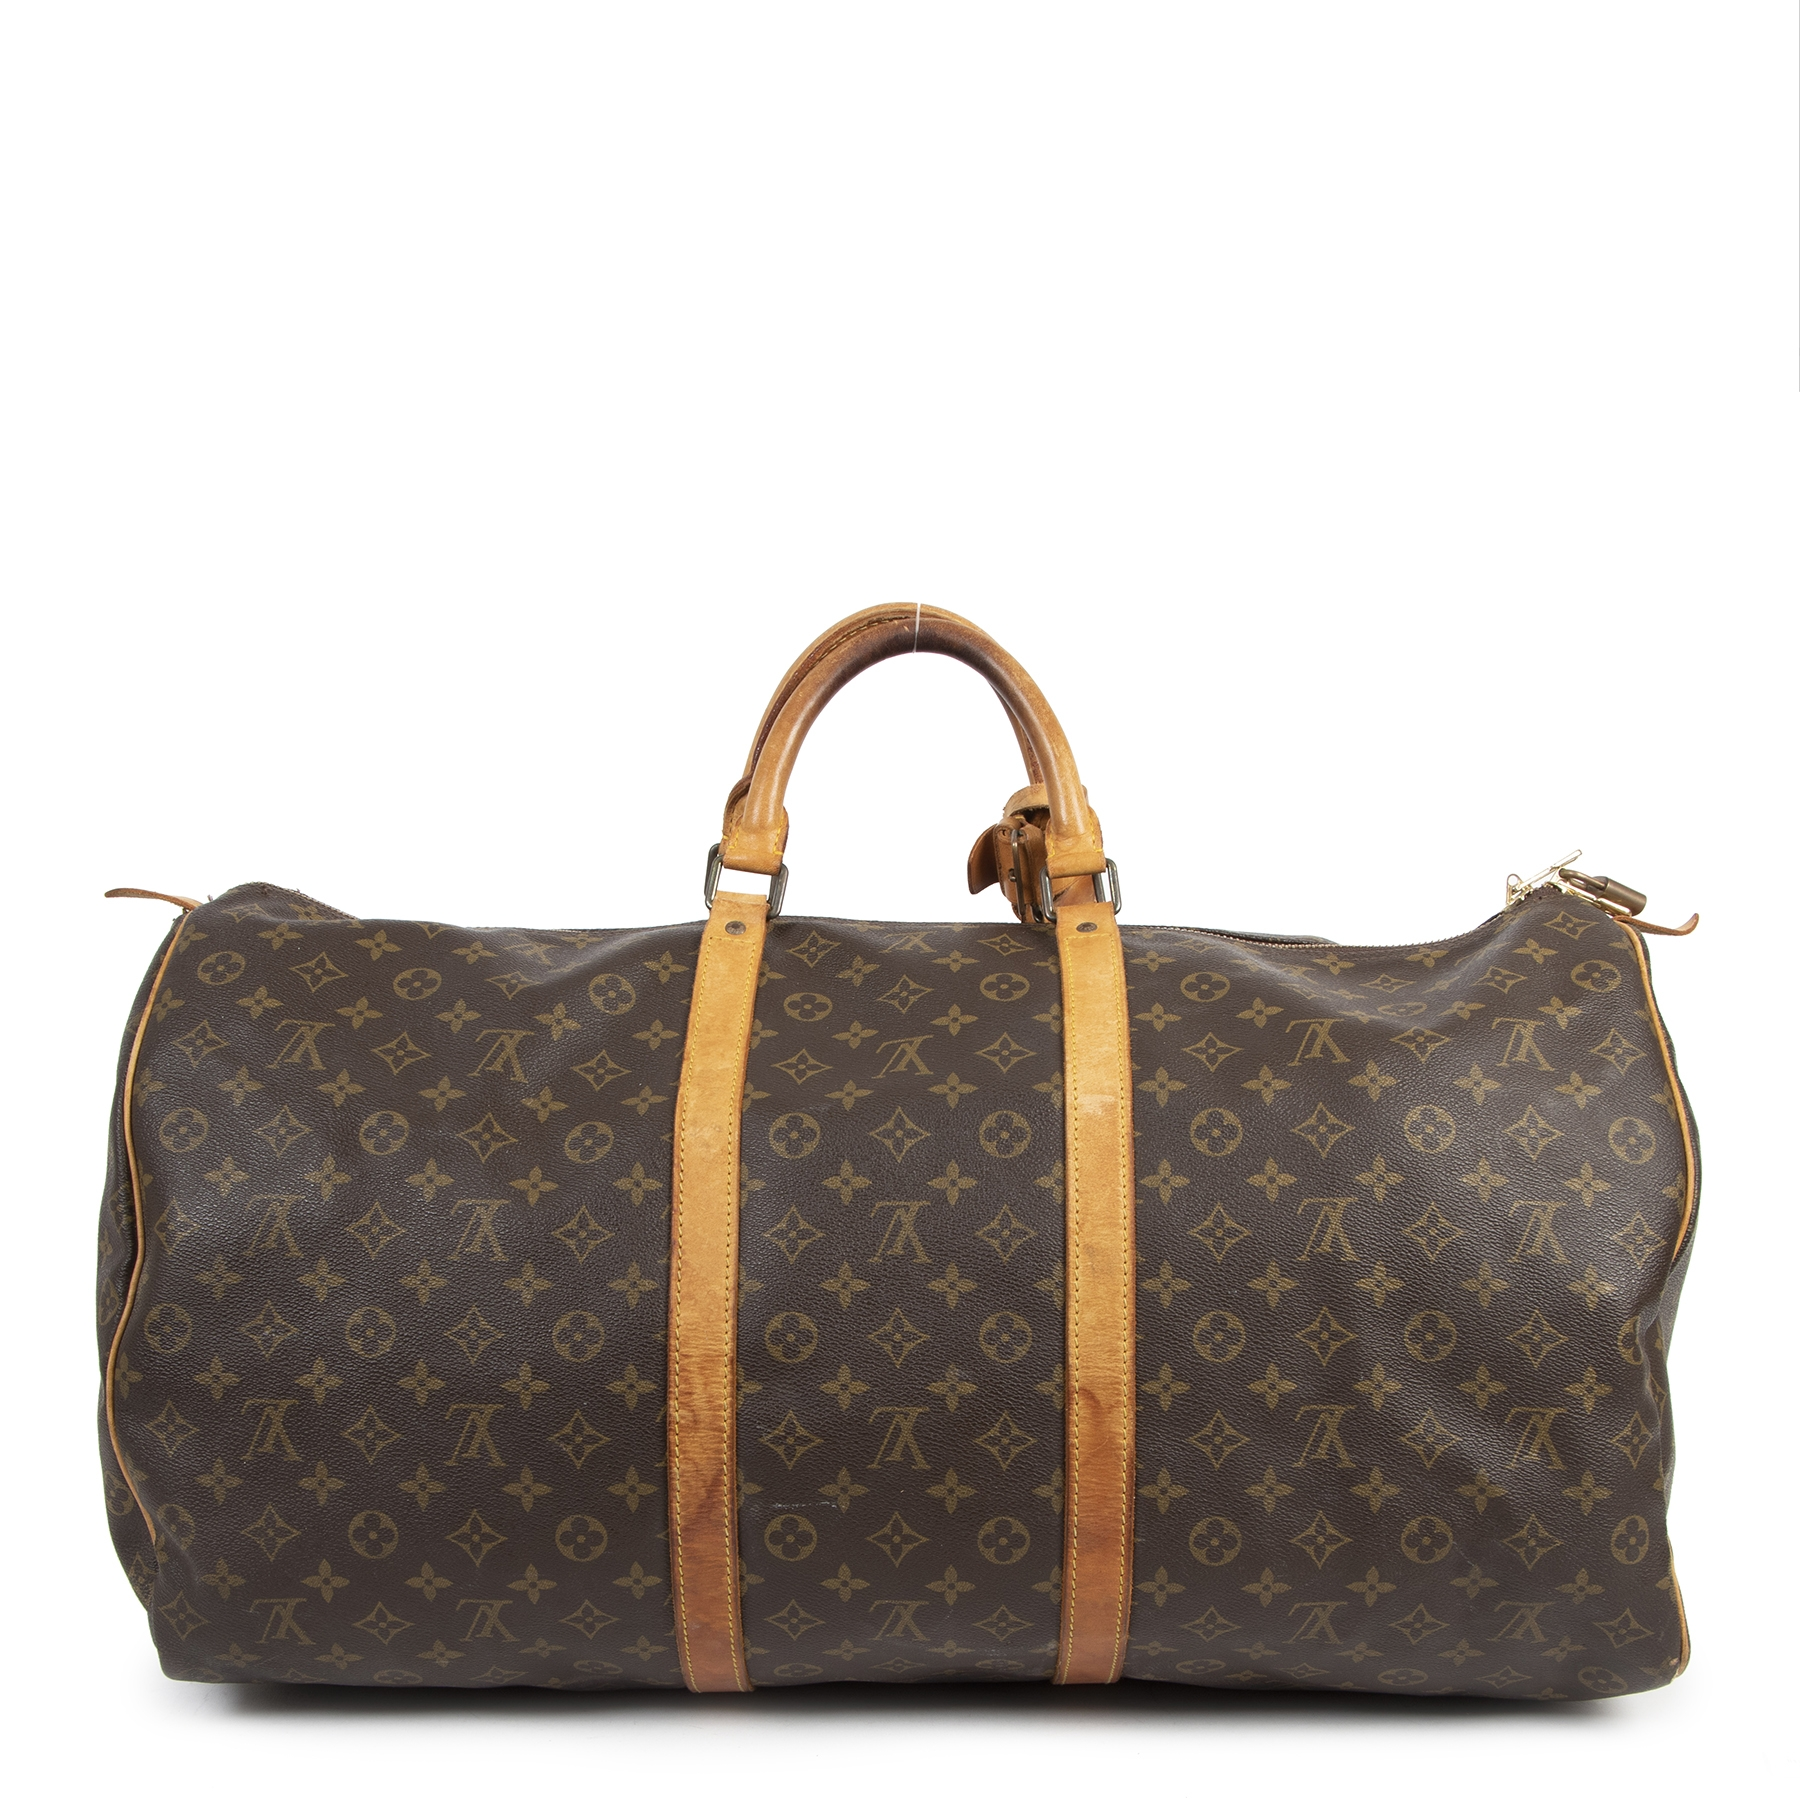 Authentic second-hand vintage Louis Vuitton Vintage Monogram Keepall 60 Bandouliere Boston Travel Bag buy online webshop LabelLOV